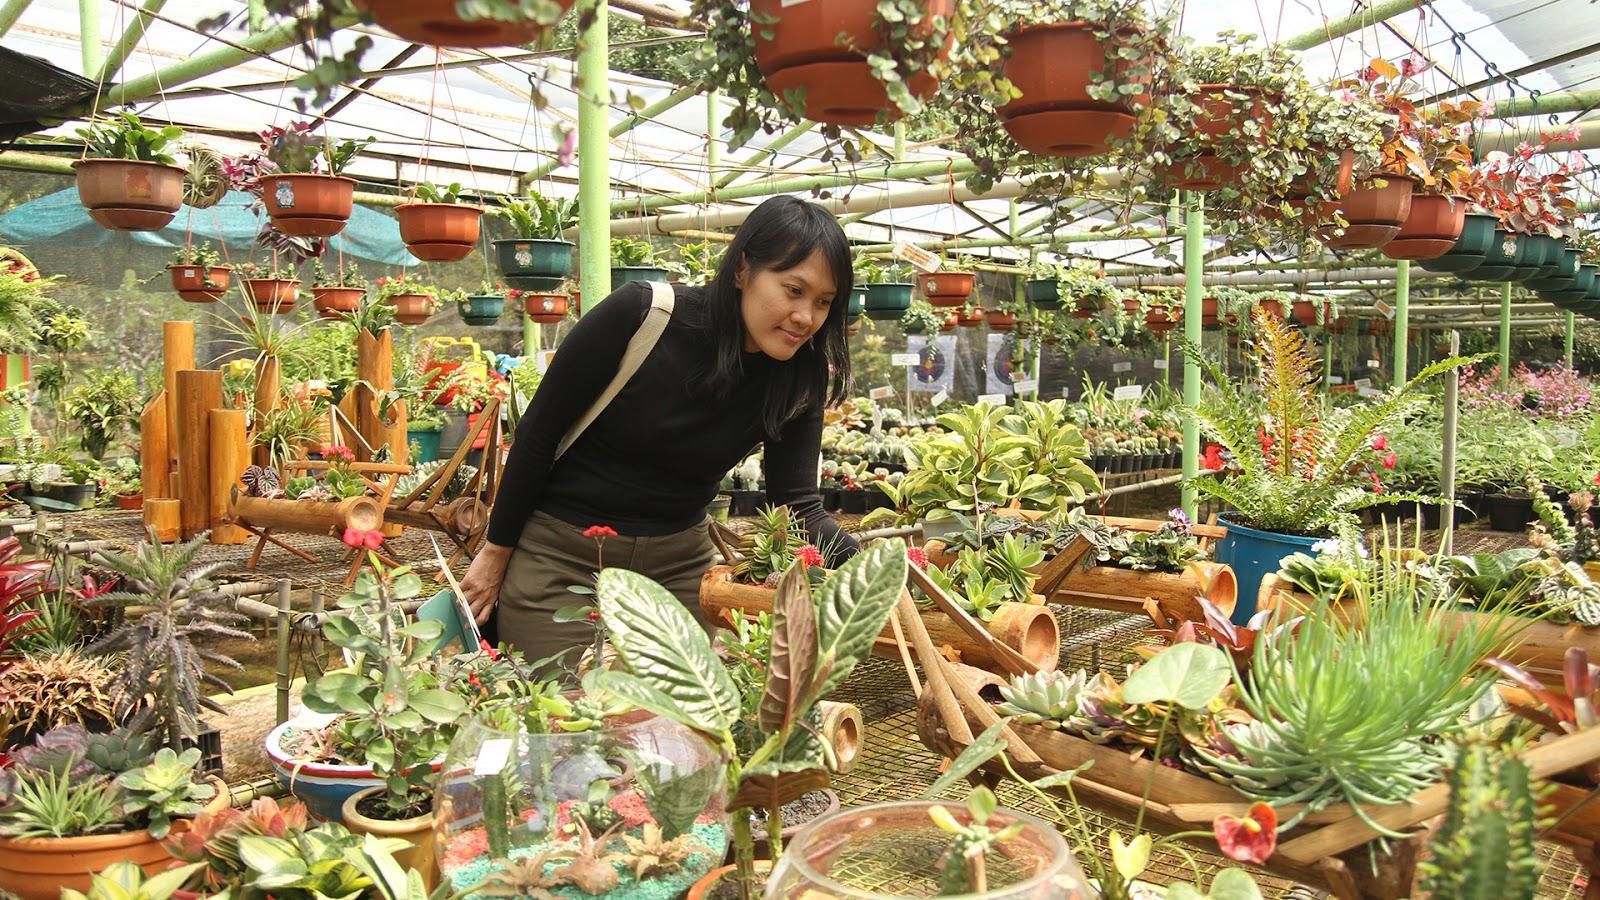 Melrimba Garden Destinasi Wisata Bunga Populer Sebagai Tempat Keluarga Lokasi